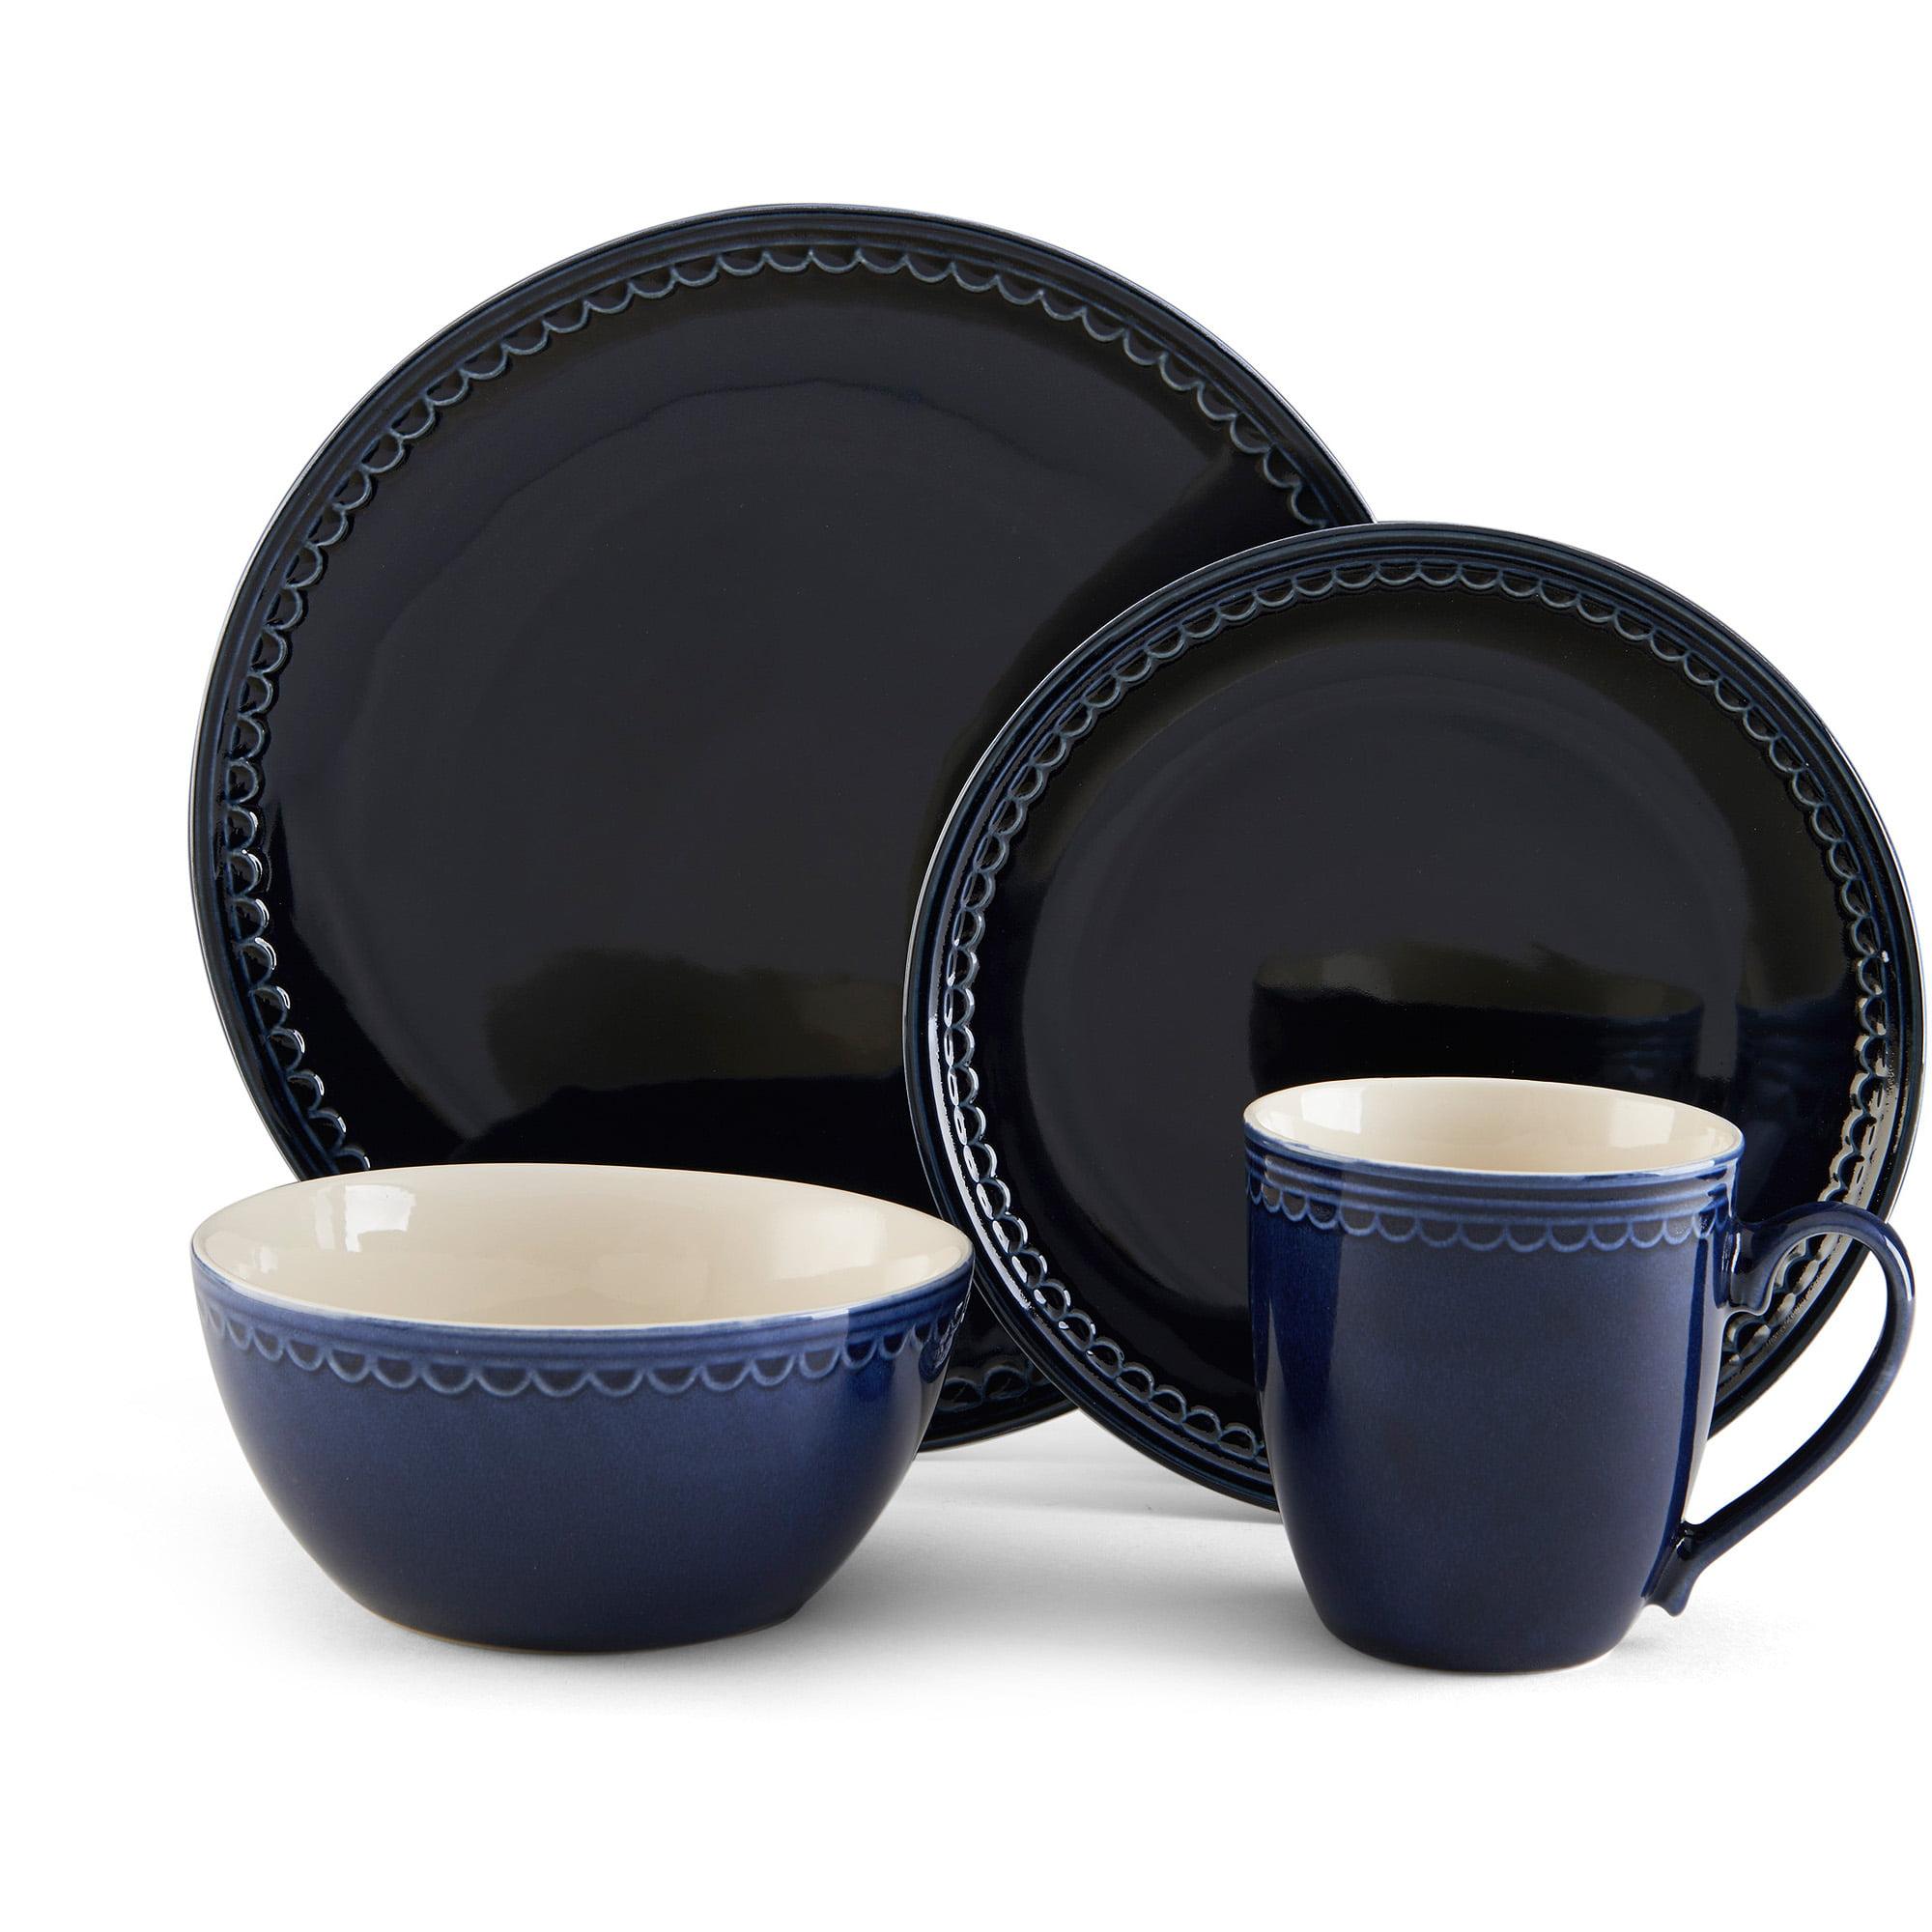 Pfaltzgraff Studio Sixteen Piece Blue Loop Stoneware Dinnerware Set